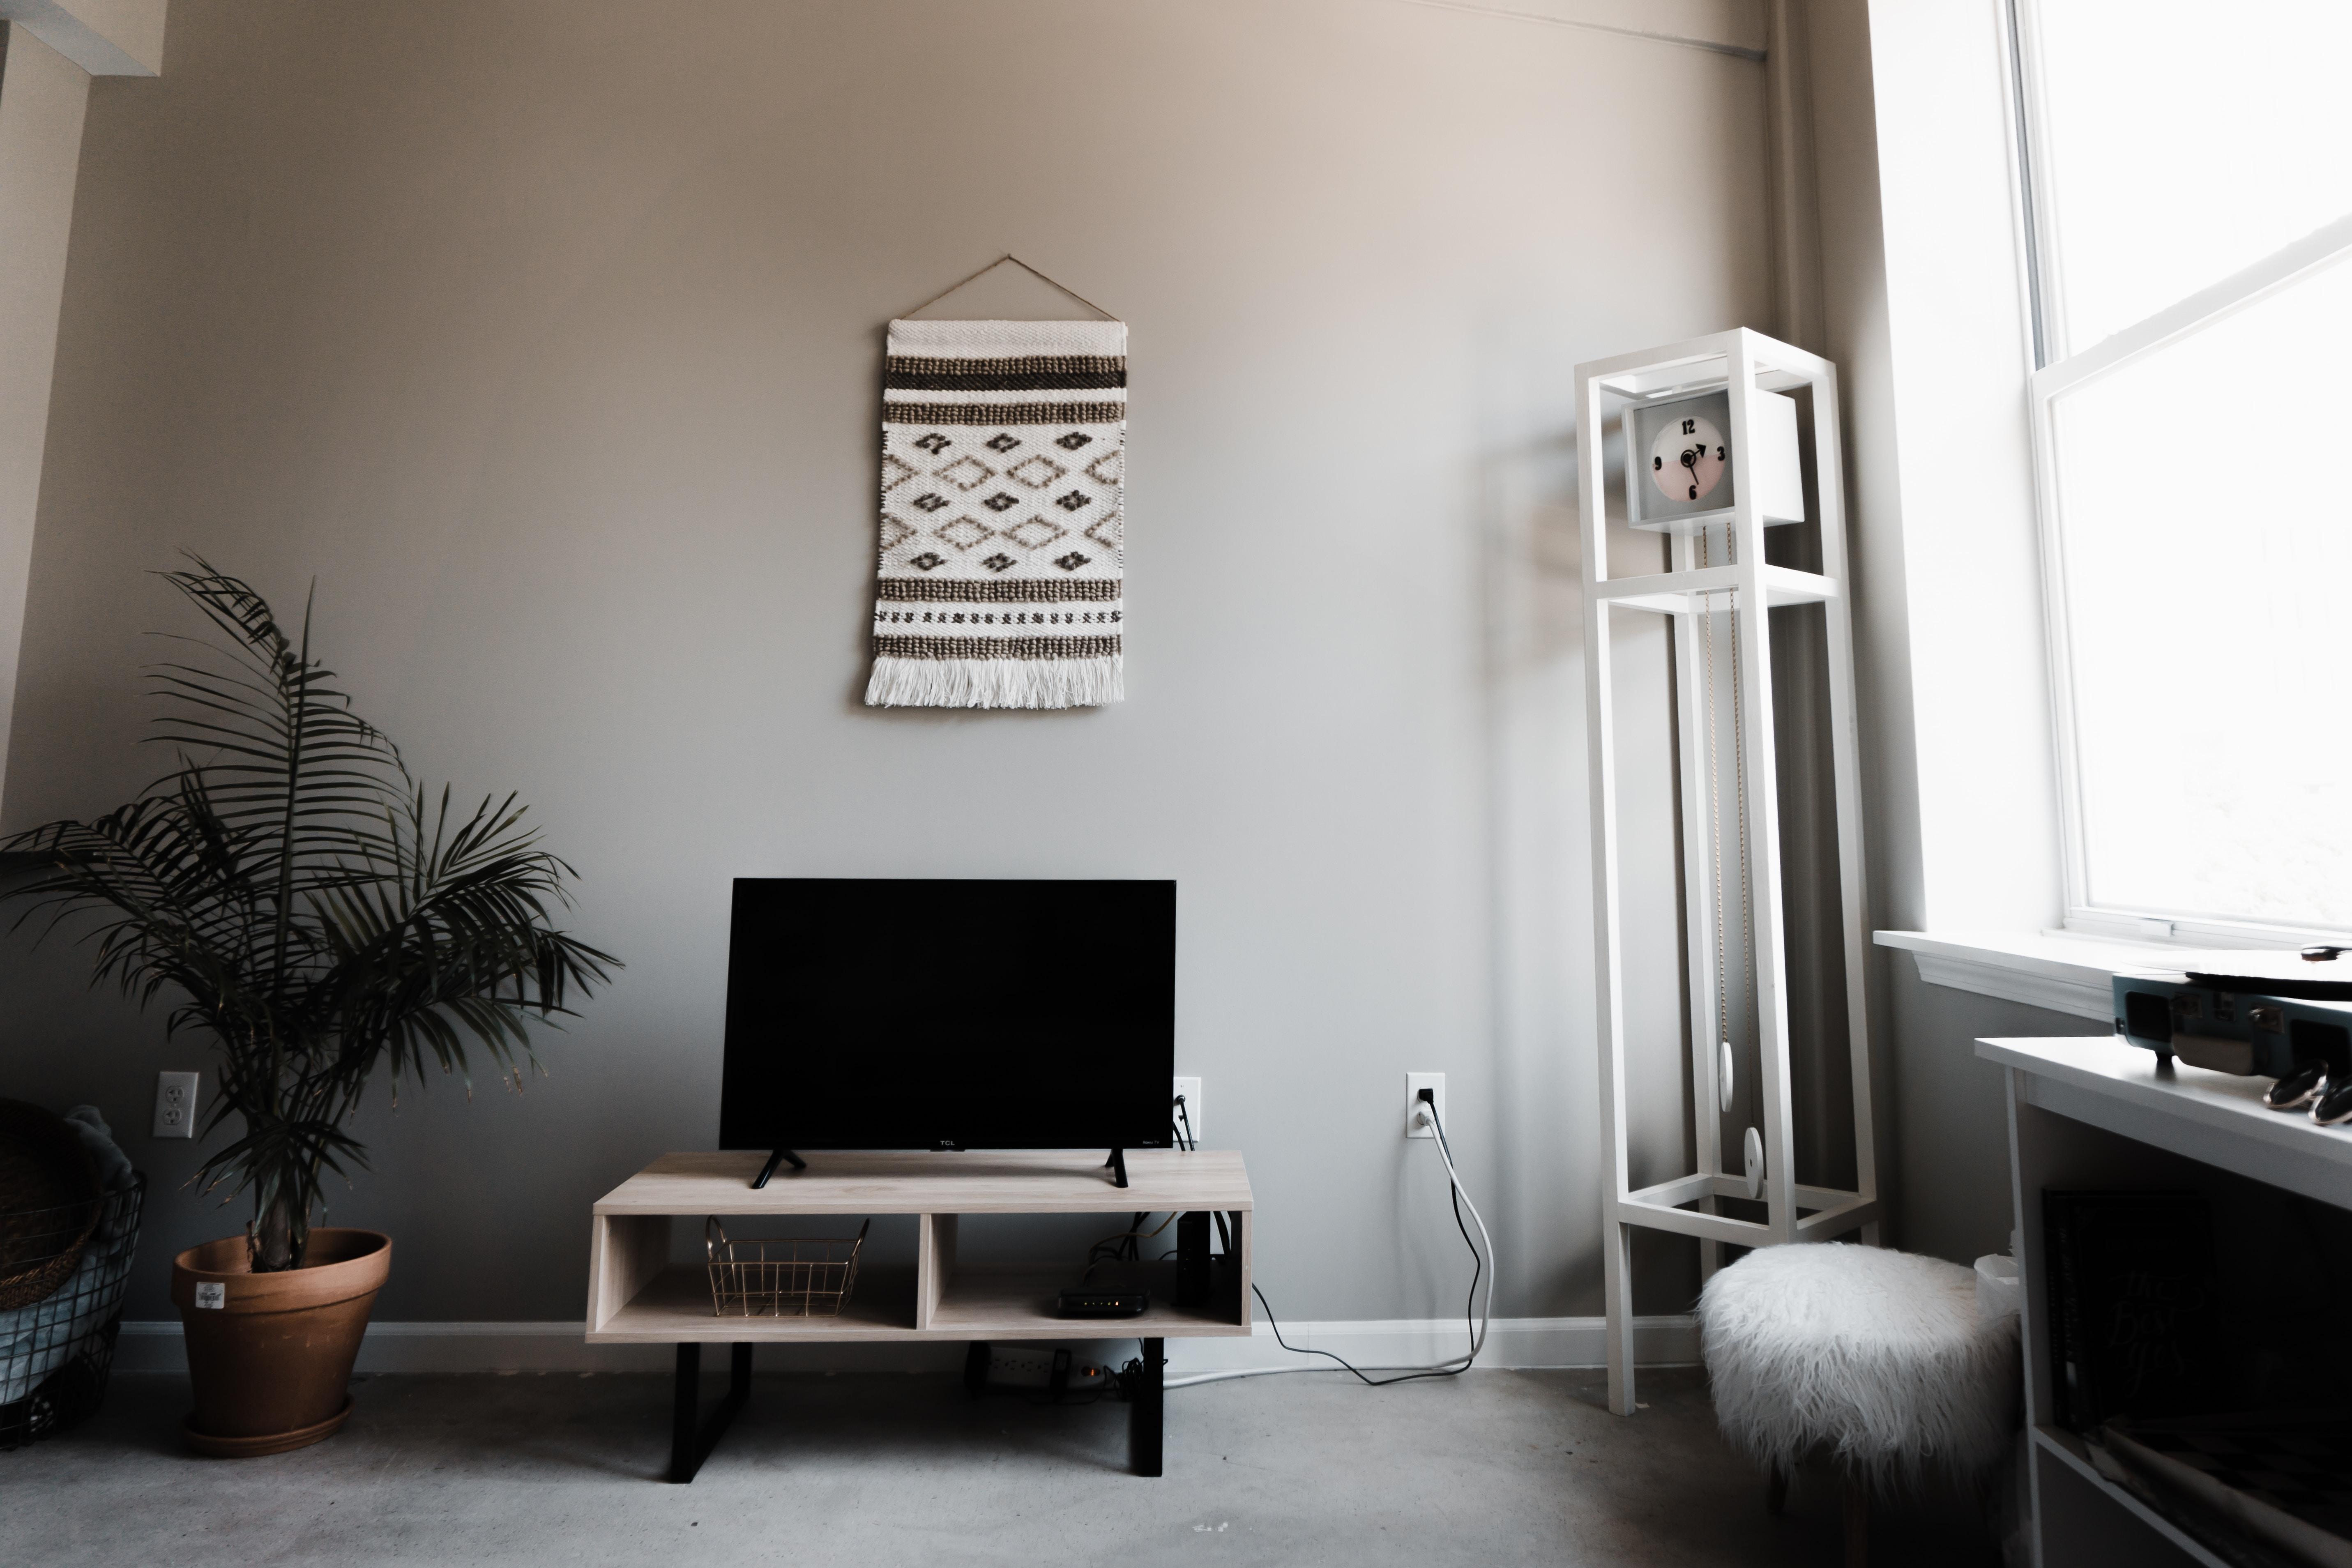 flat screen TV on top of rack